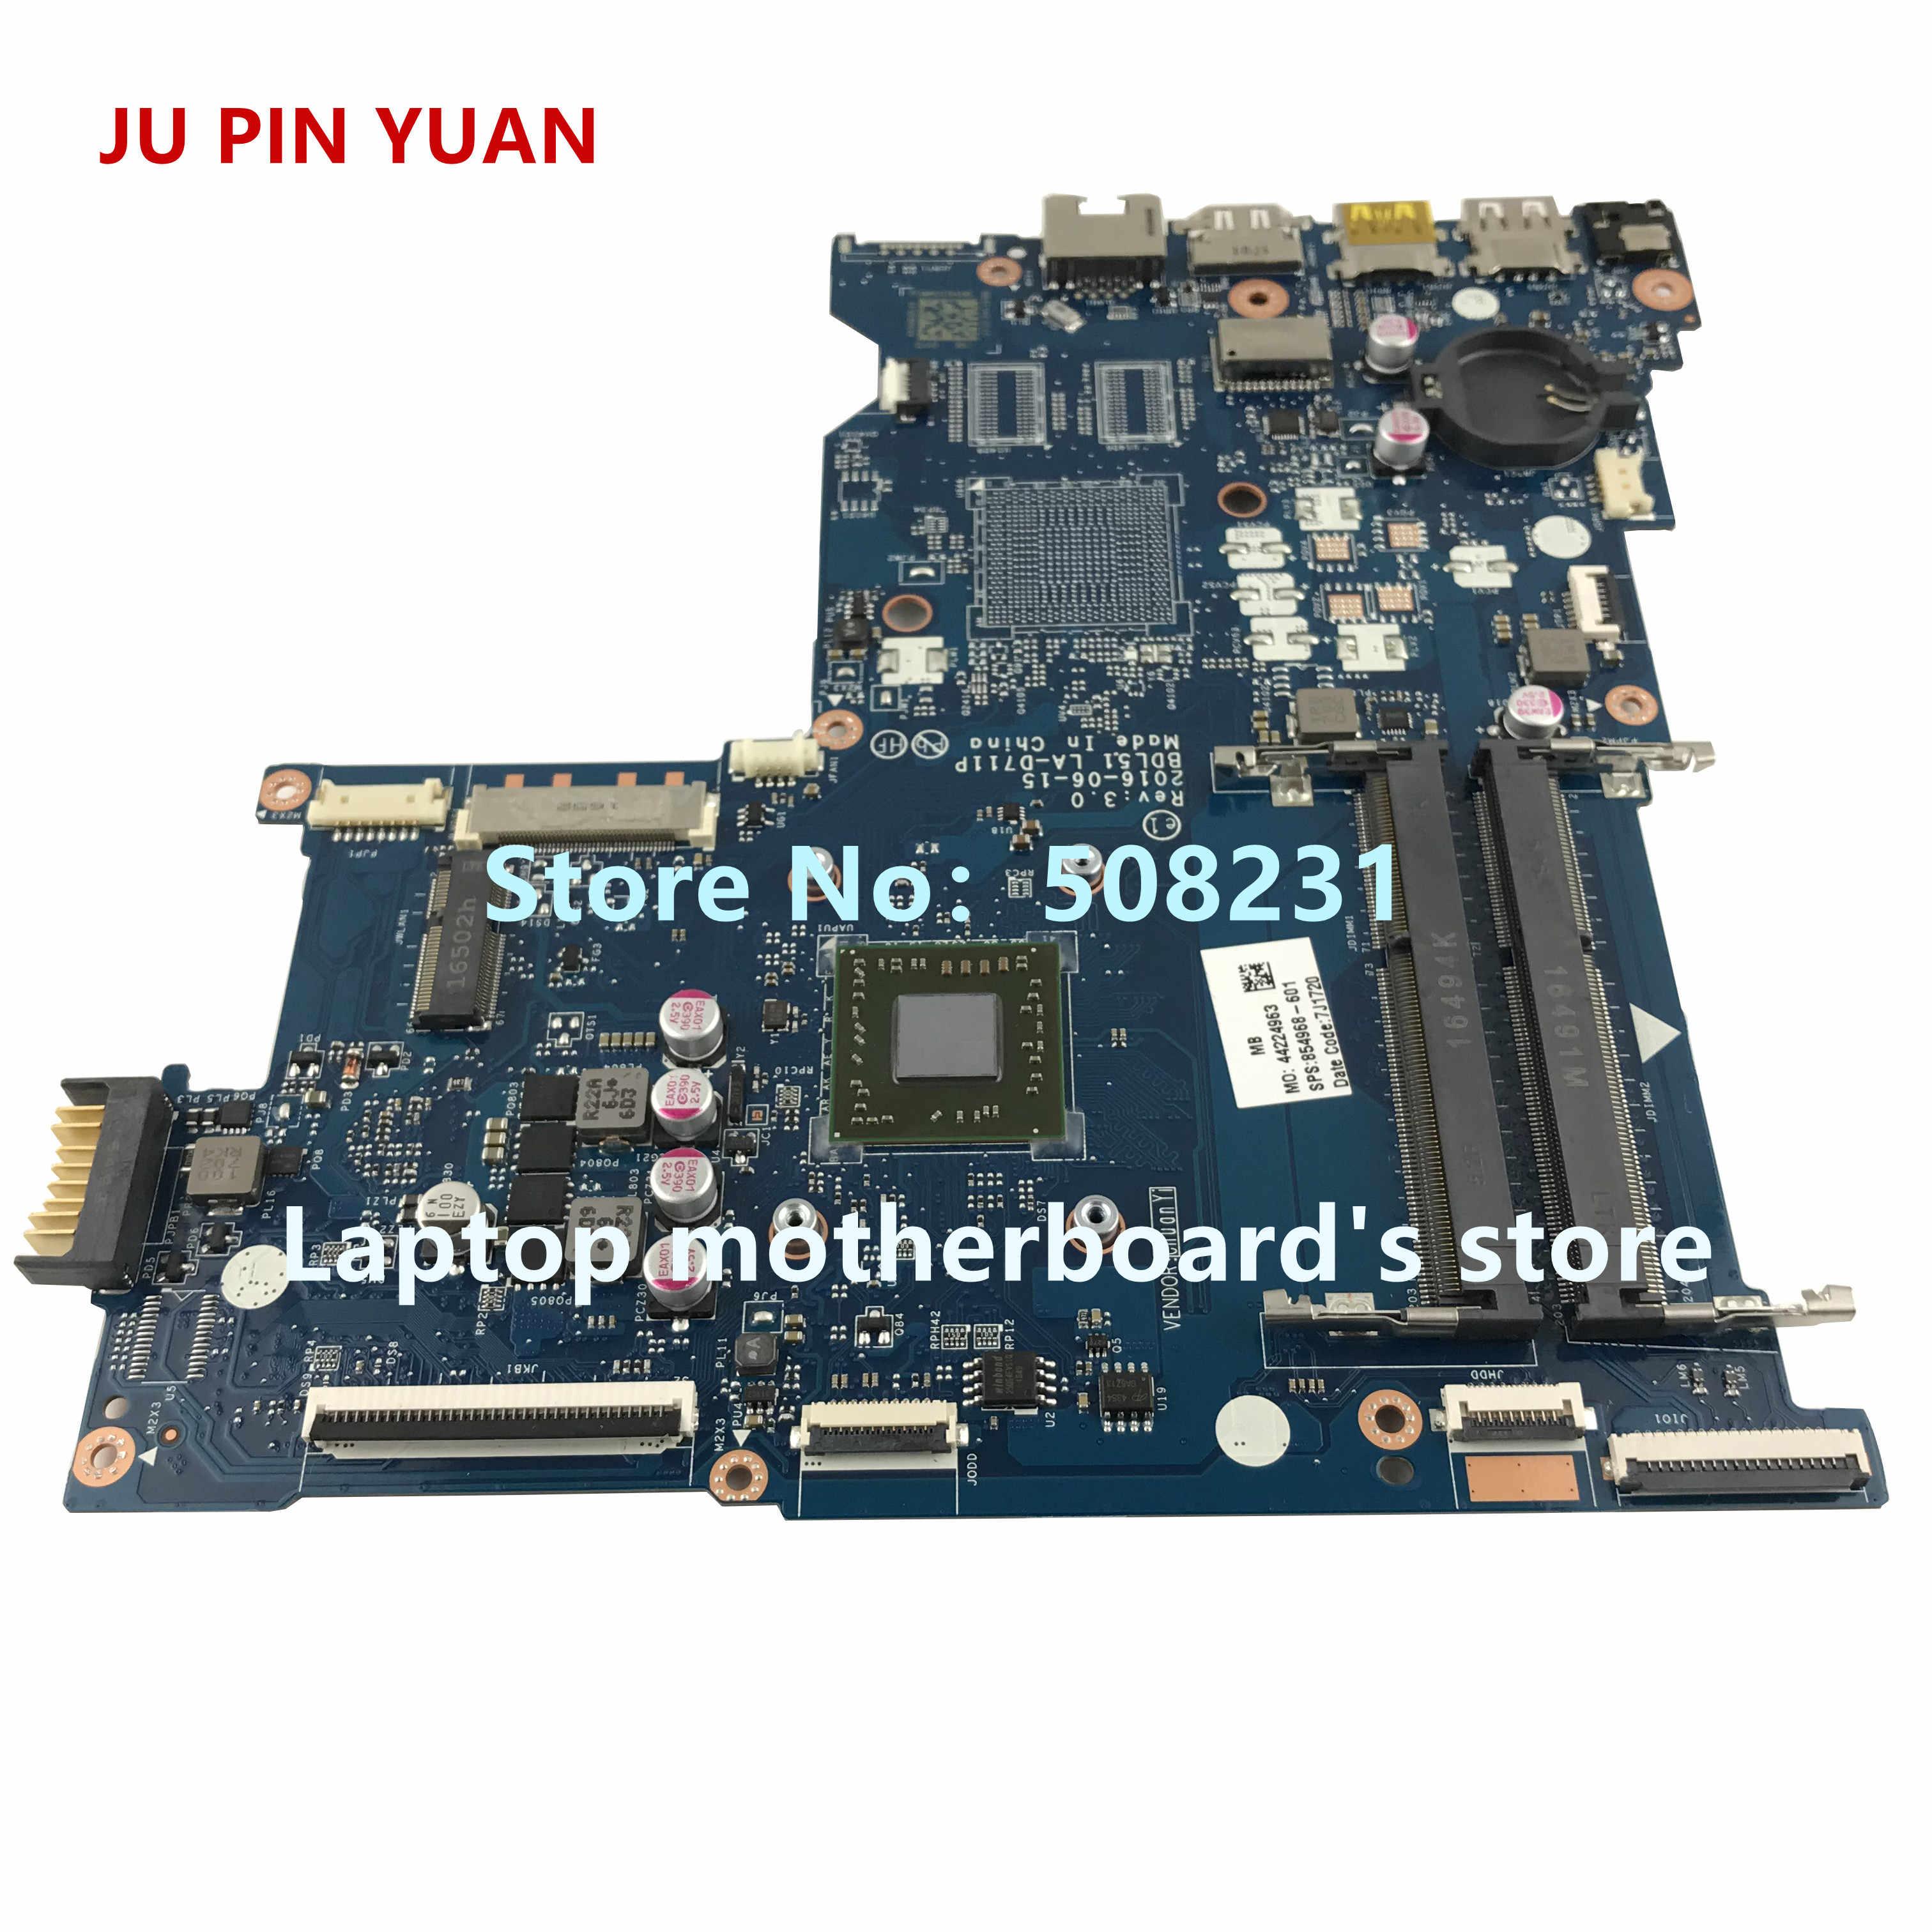 ג 'ו סיכה יואן 854968-001 mainboard 854968-601 עבור HP מחברת 15-BA 15Z-BA 15-ba060nf מחשב נייד האם BDL51 LA-D711P E2-7110